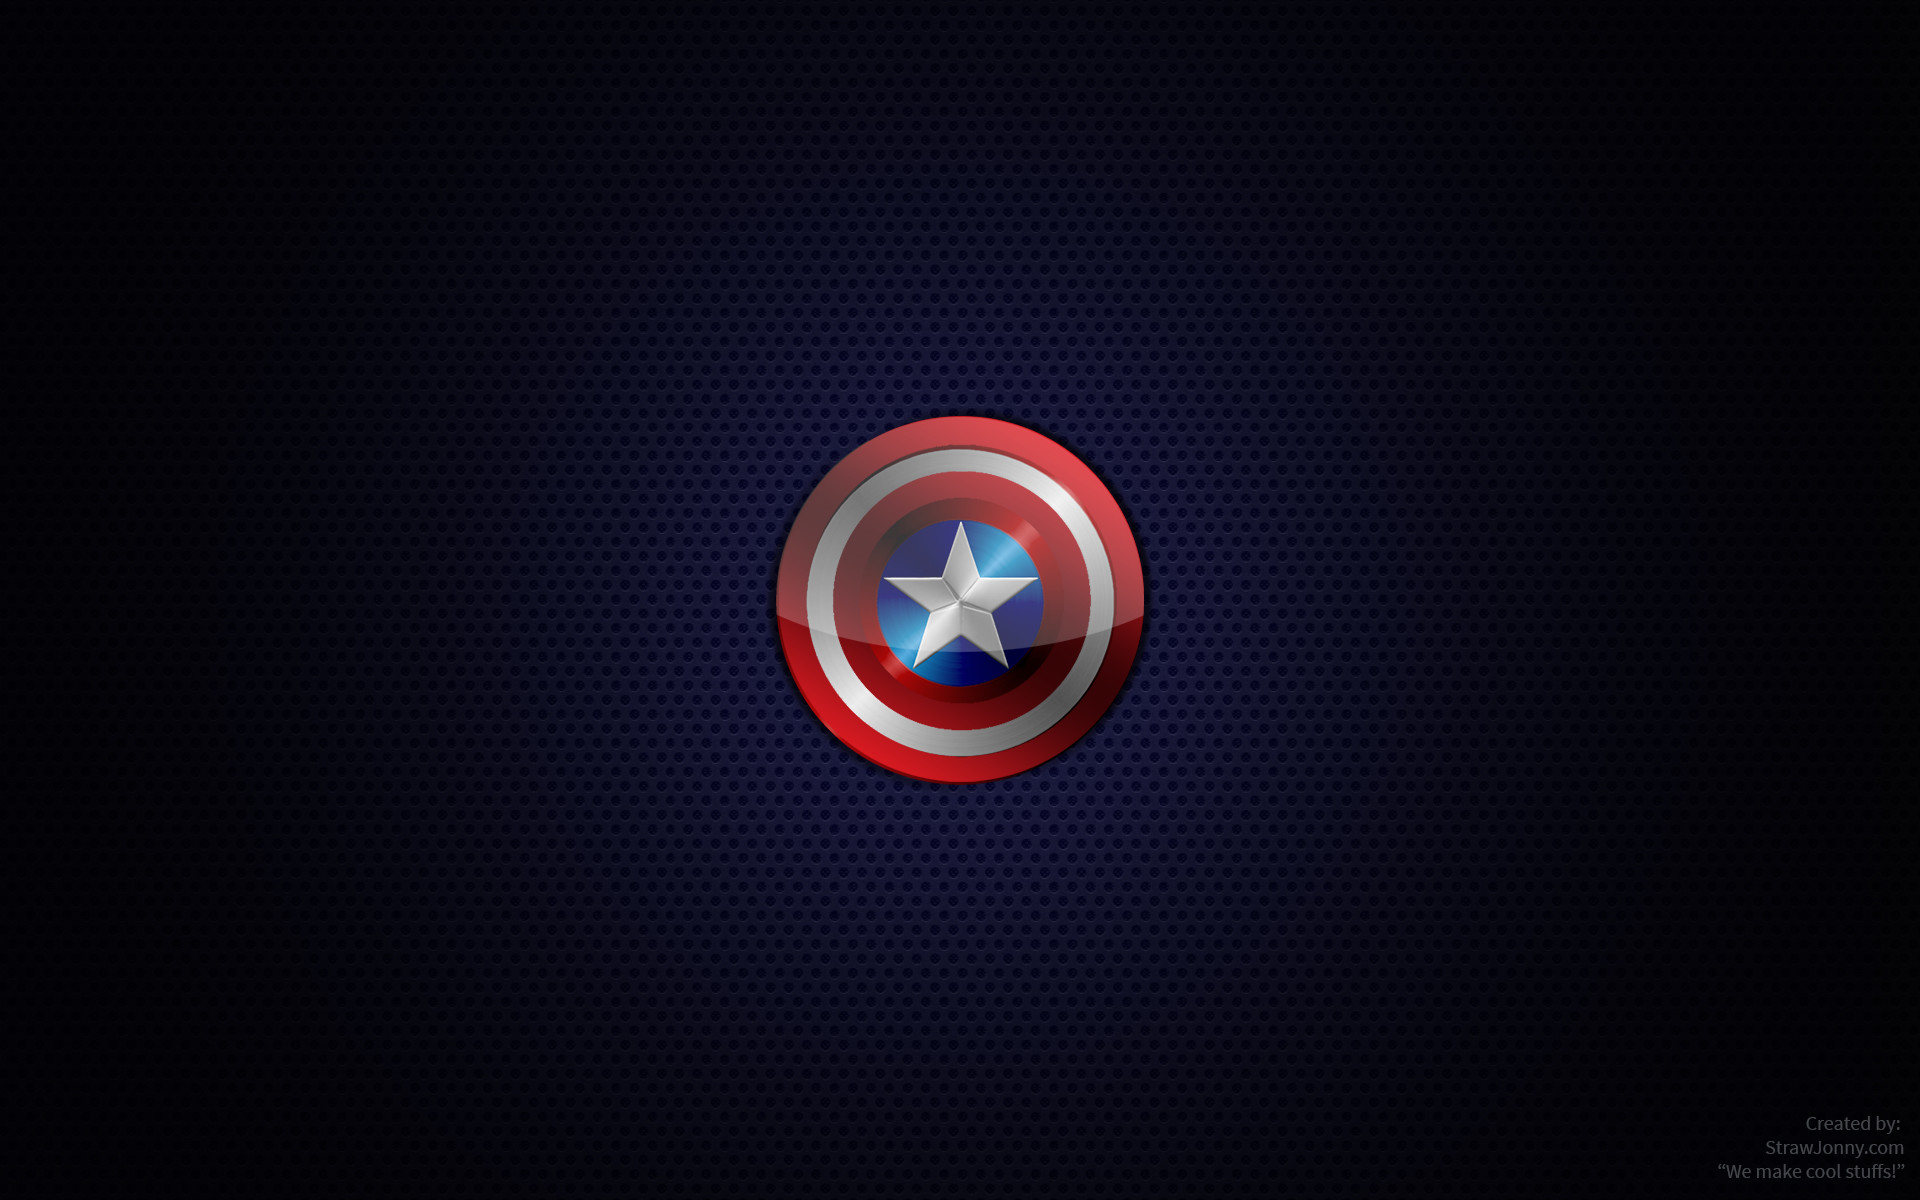 Zelda Iphone Wallpaper Captain America Shield Wallpaper Hd 84 Images